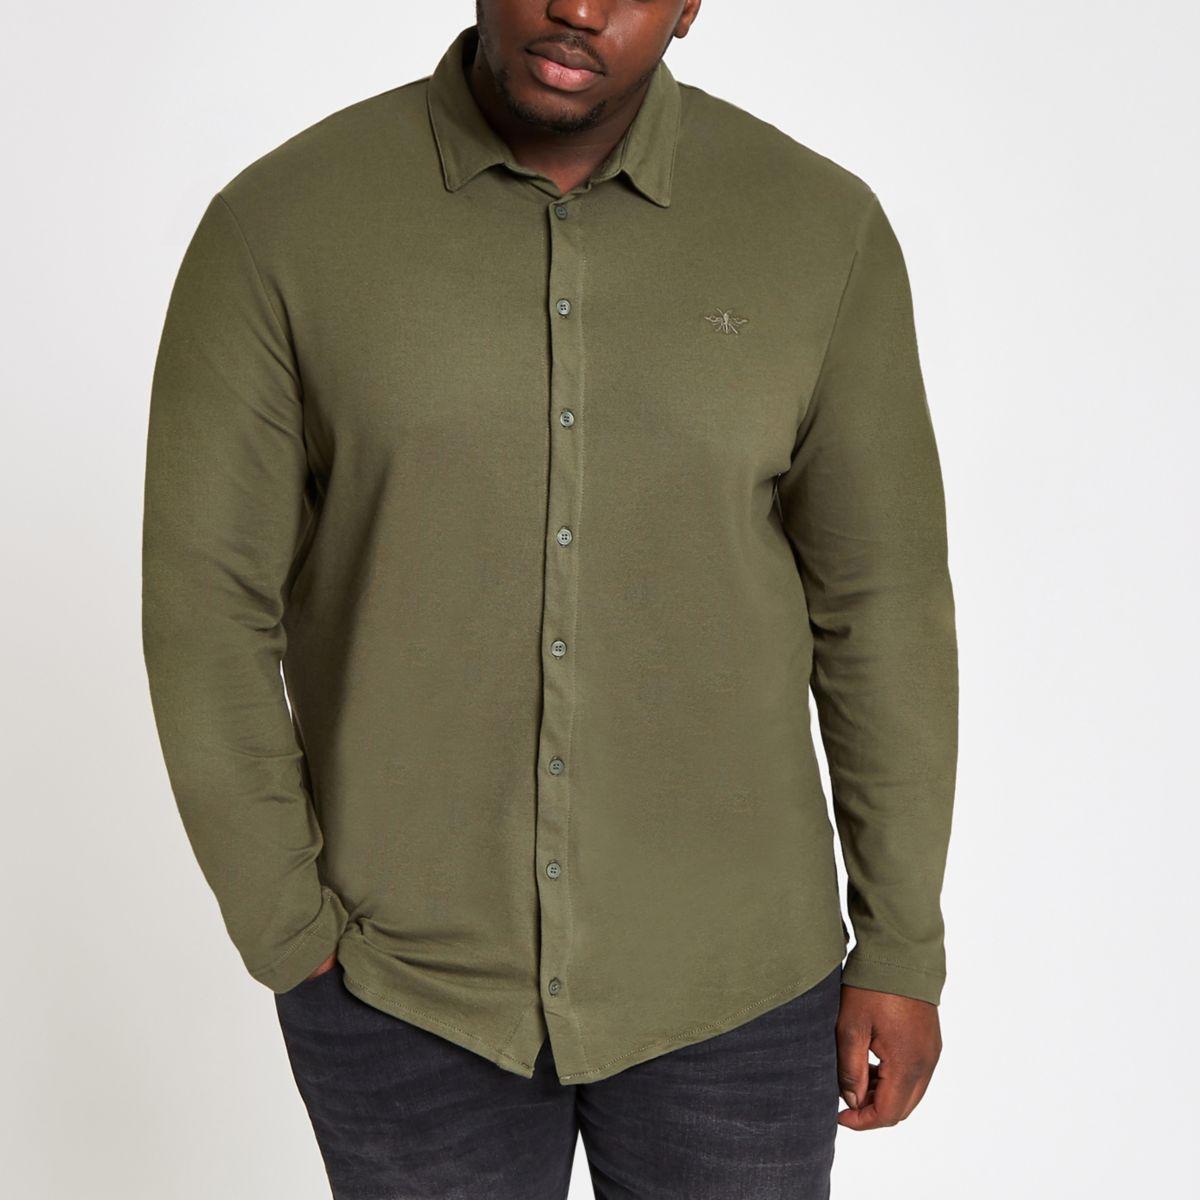 Big & Tall dark green button down shirt